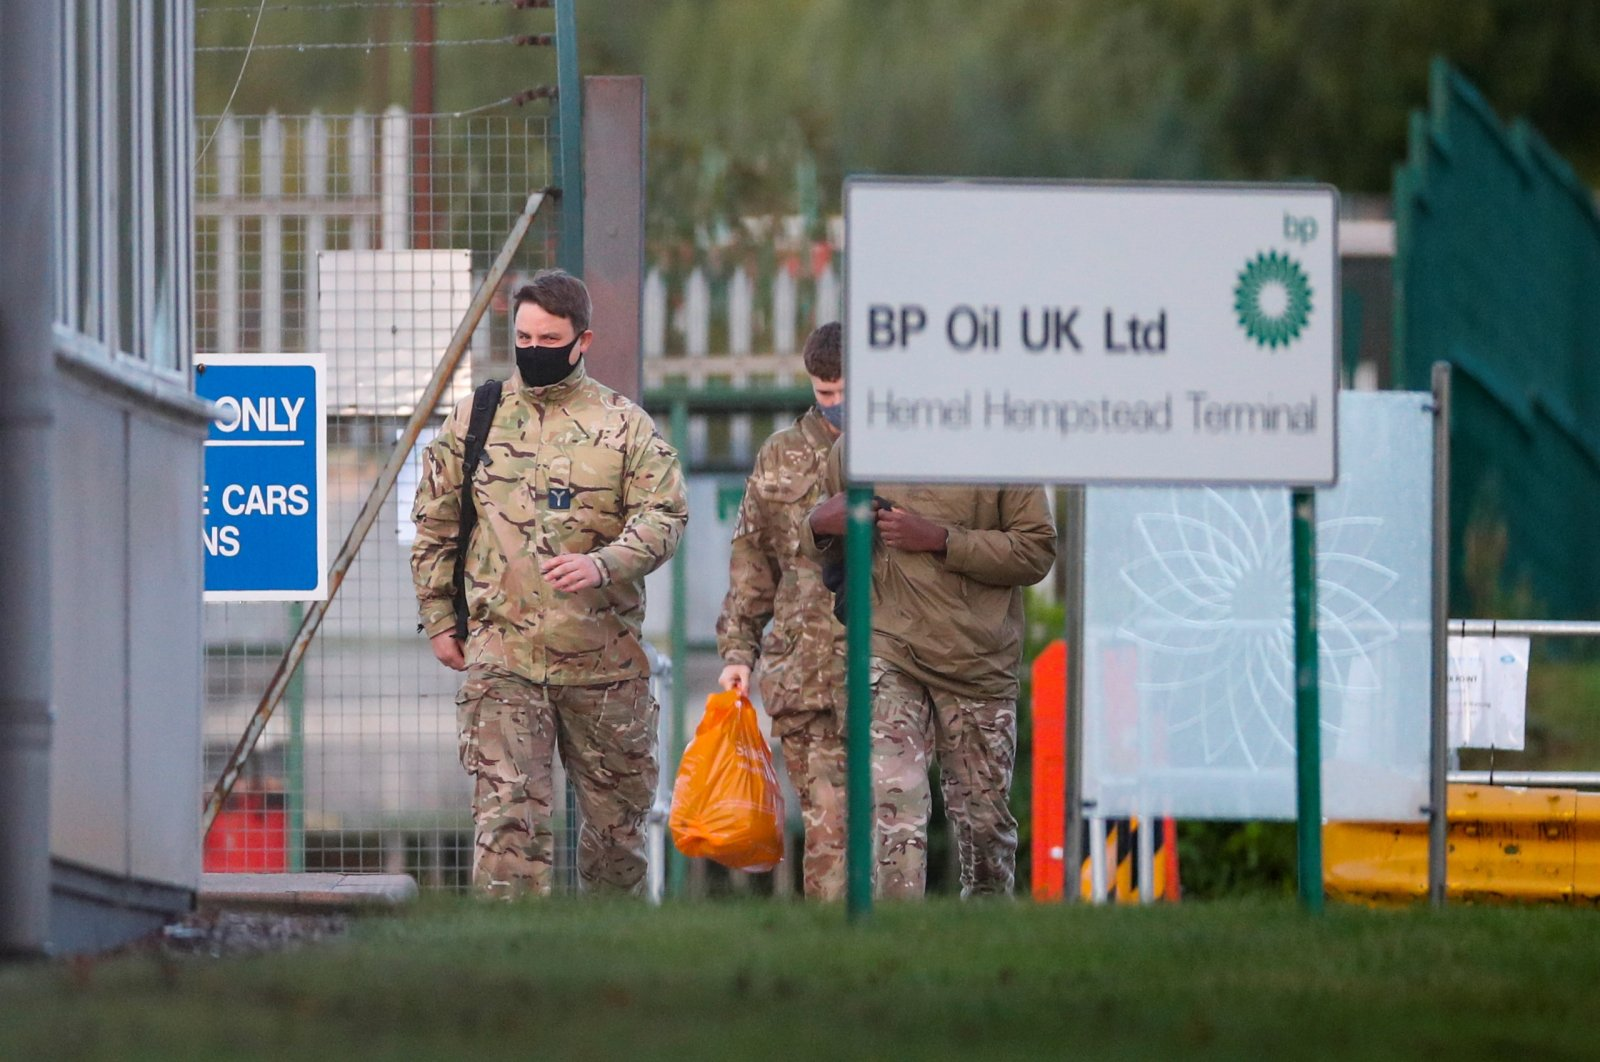 Members of the military walk at Buncefield Oil Depot in Hemel Hempstead, Britain, Oct. 4, 2021. (Reuters Photo)